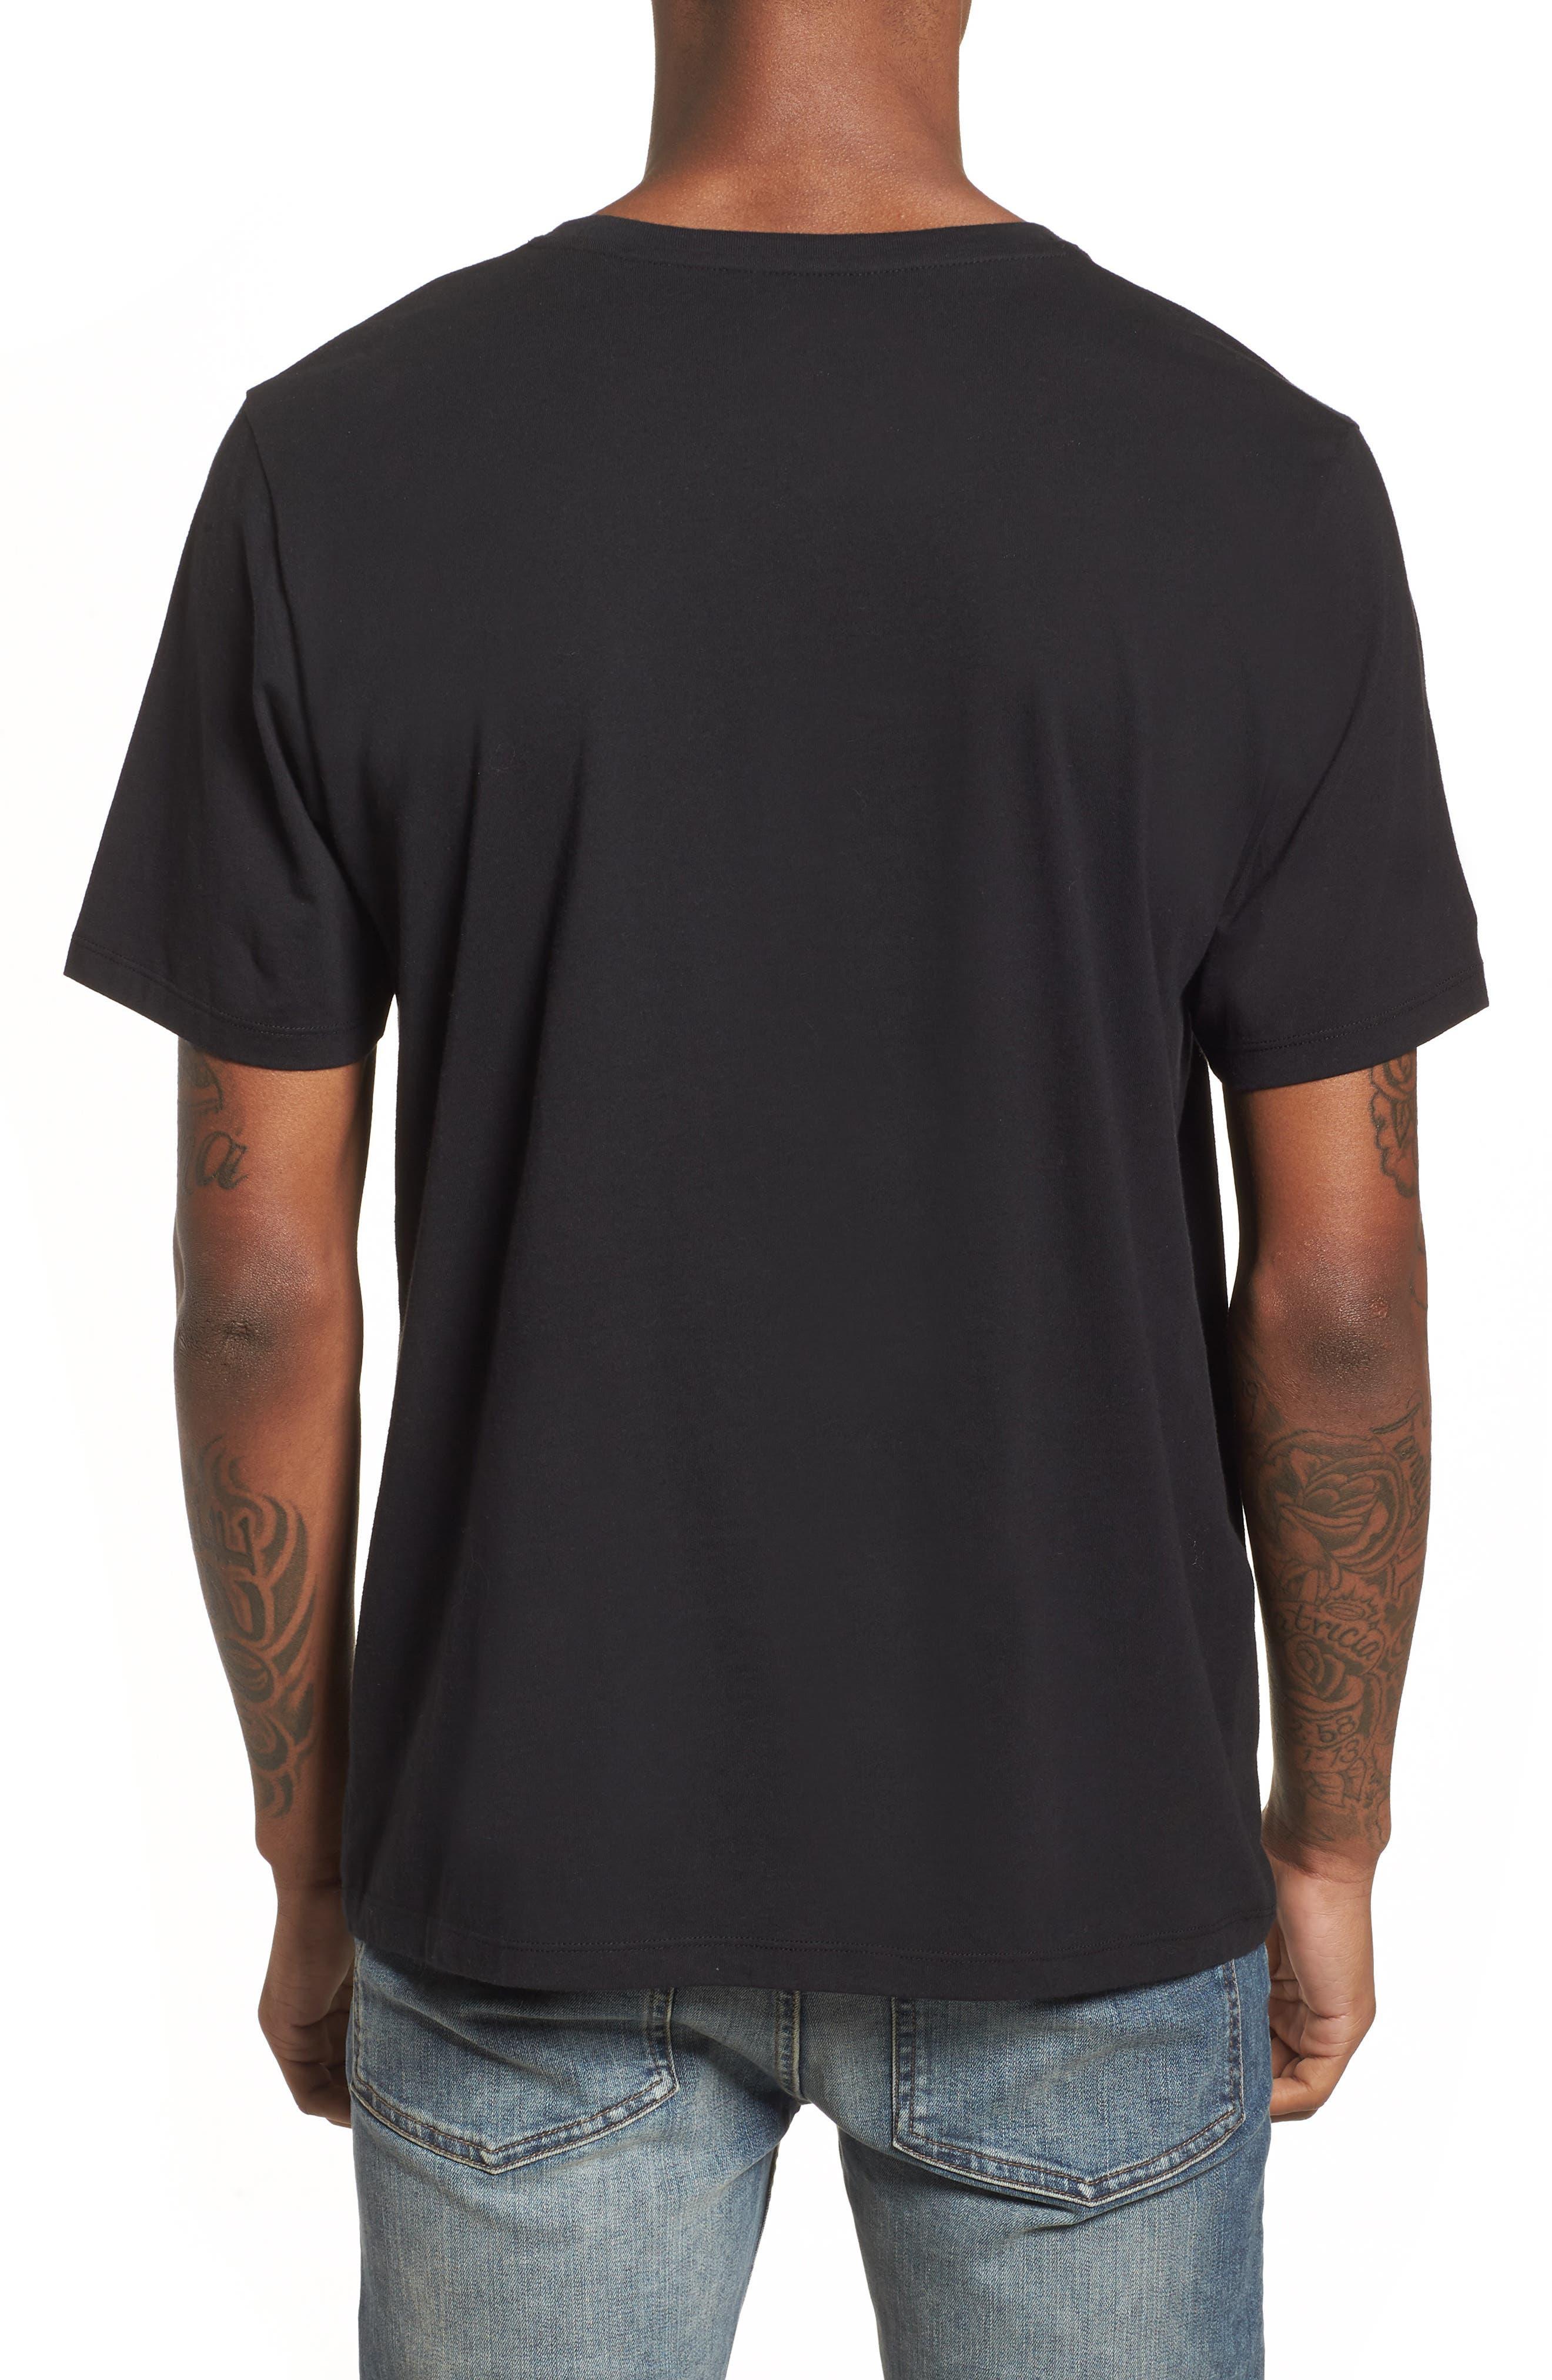 Cherub Graphic T-Shirt,                             Alternate thumbnail 2, color,                             001